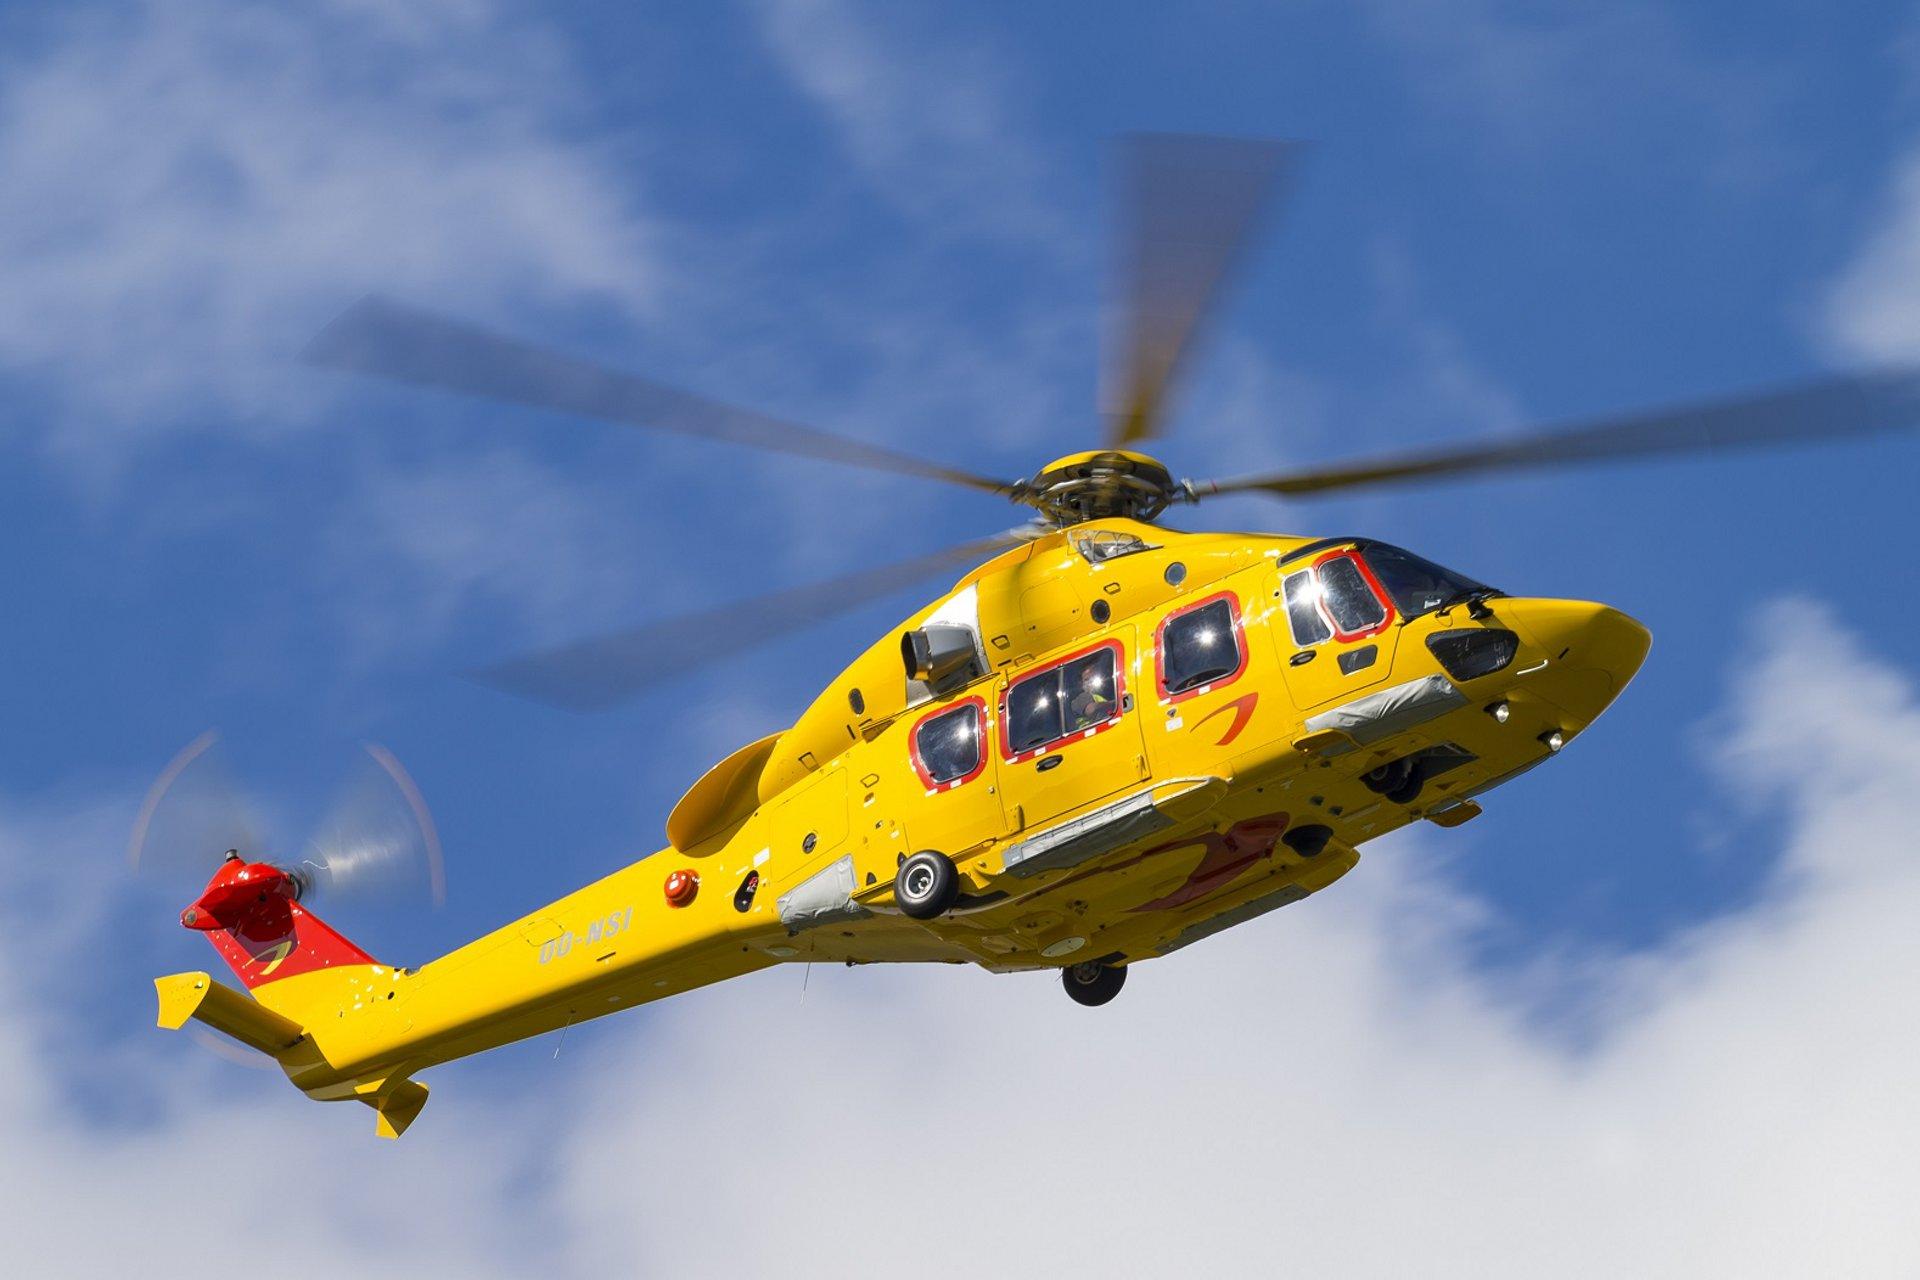 Proven in service: NHV's H175 fleet reaches 10,000 flight hours